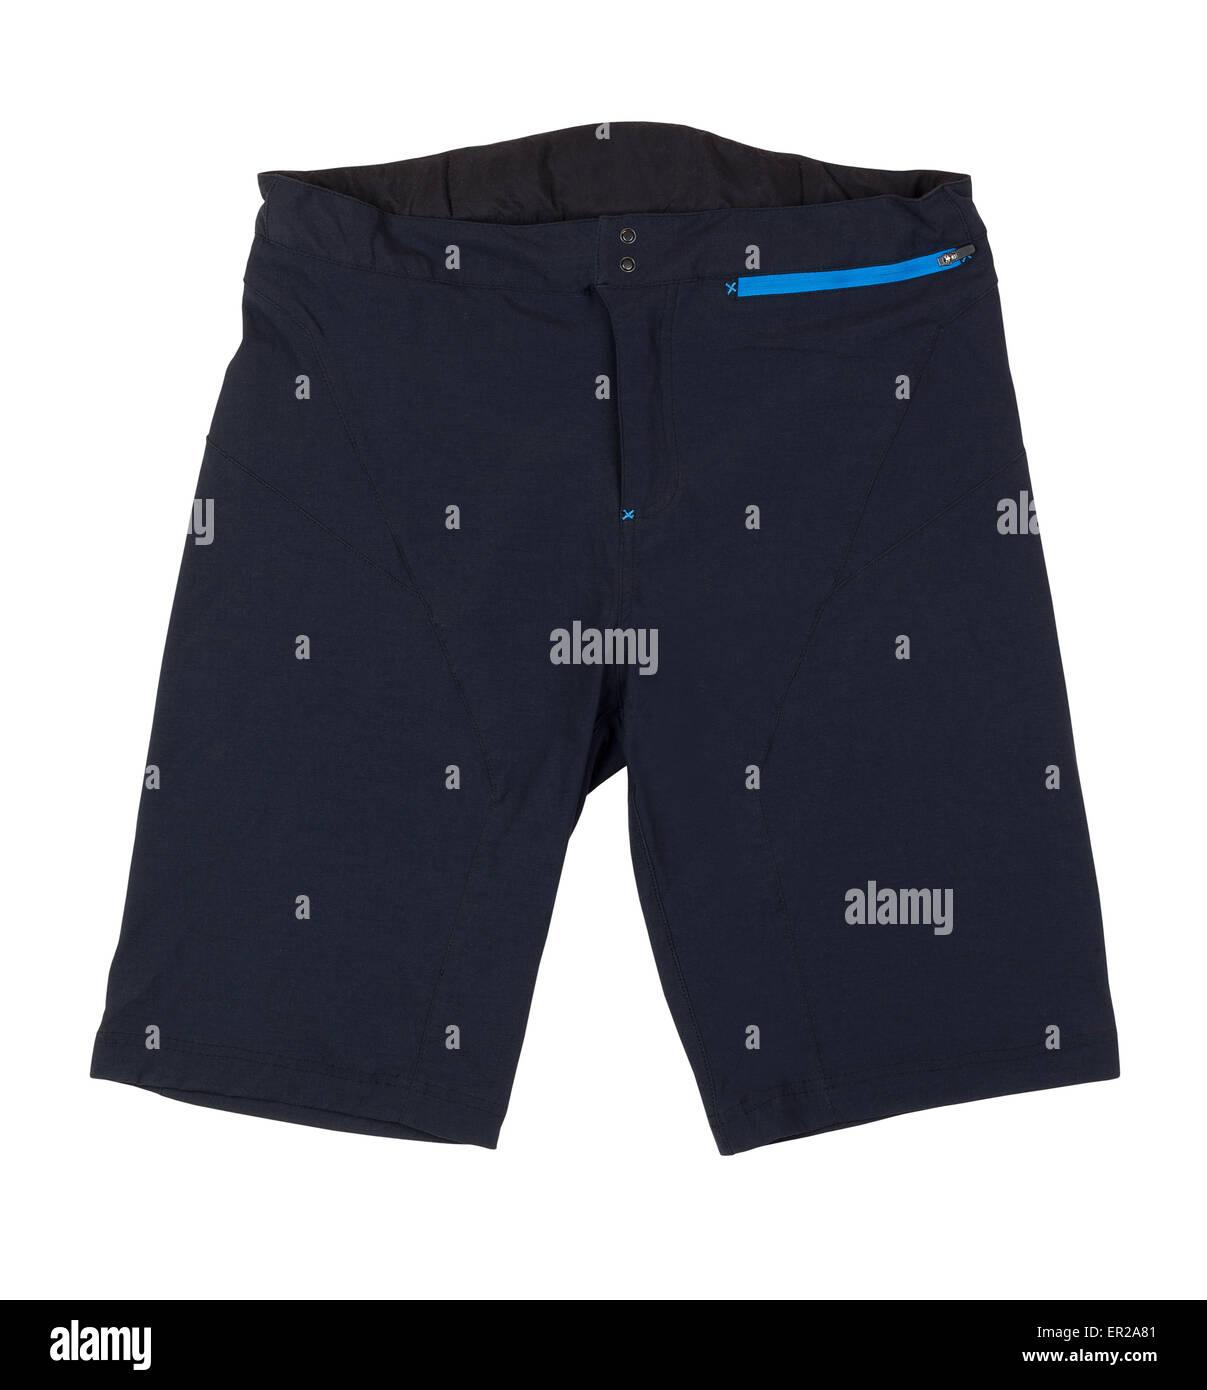 cycling shorts isolated - Stock Image